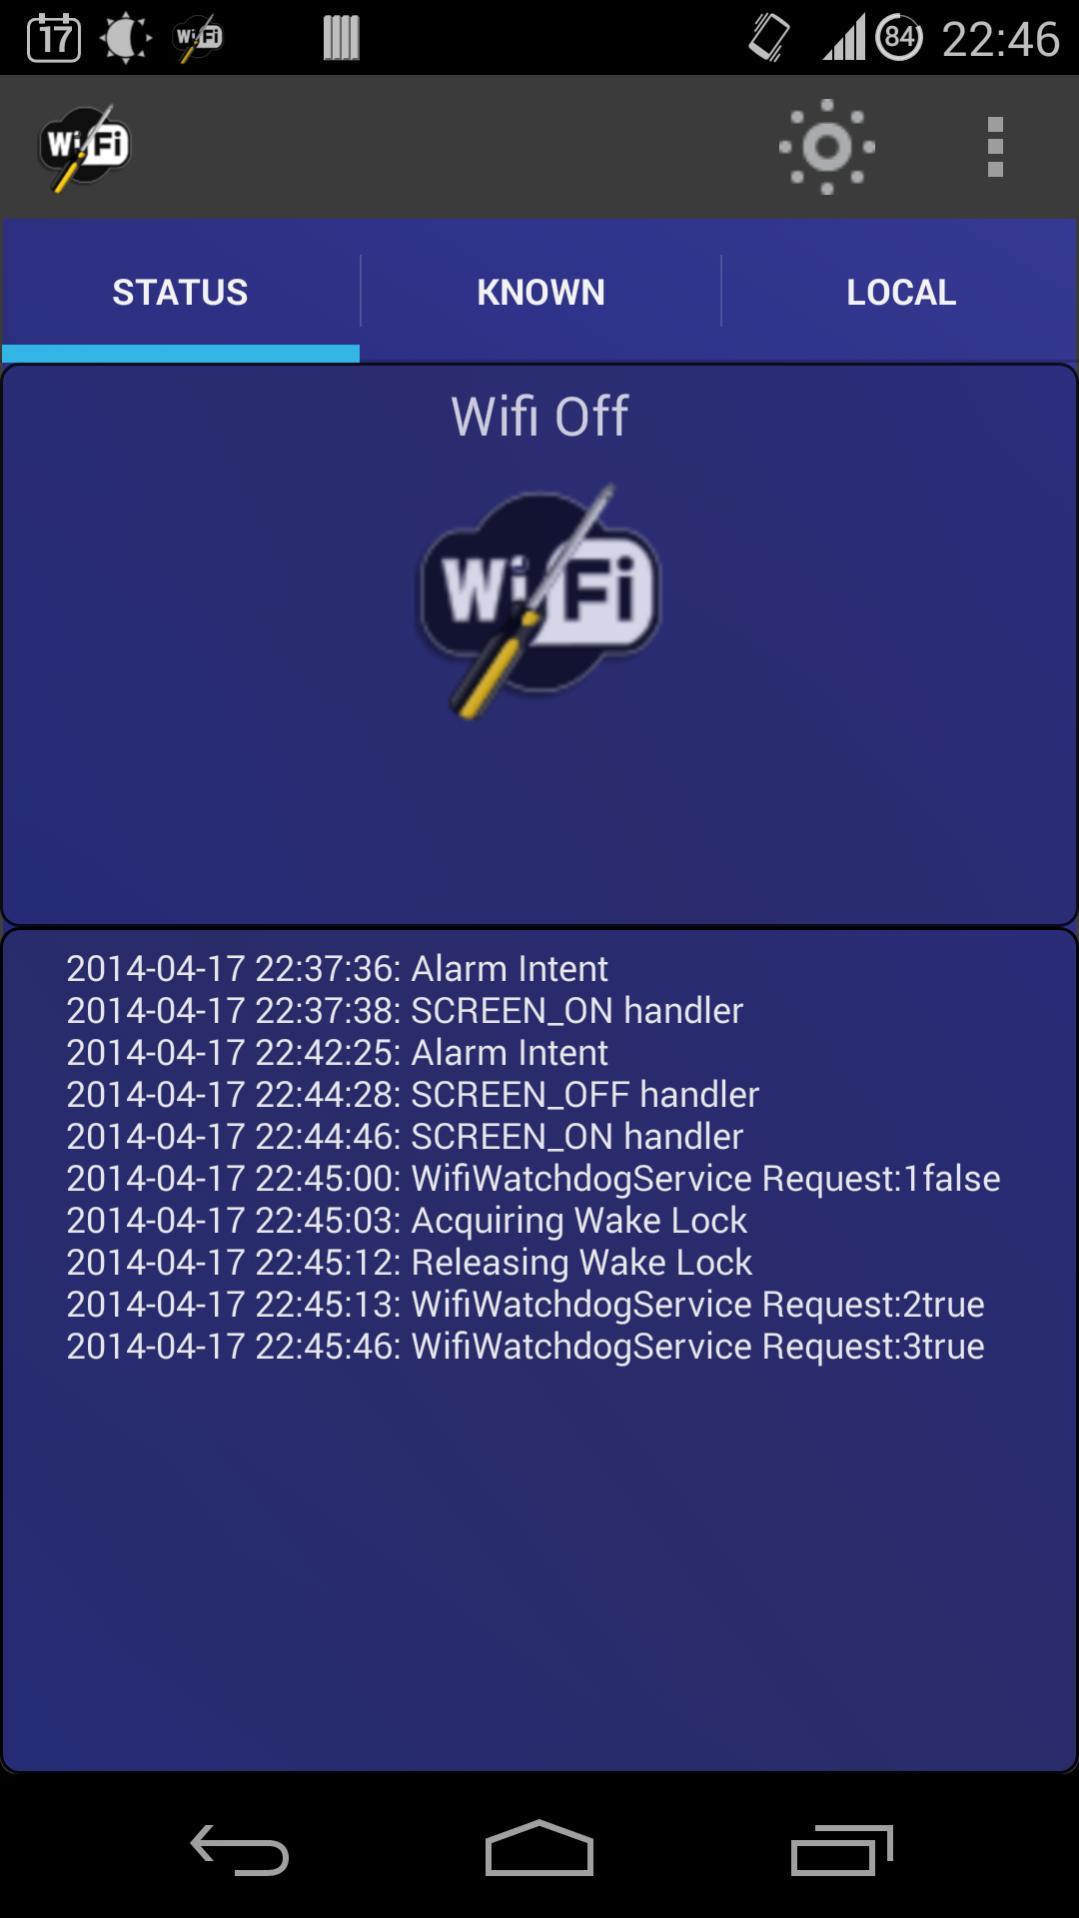 Click image for larger version  Name:Screenshot_2014-04-17--22-46-11.jpg Views:23187 Size:134.5 KB ID:2692746